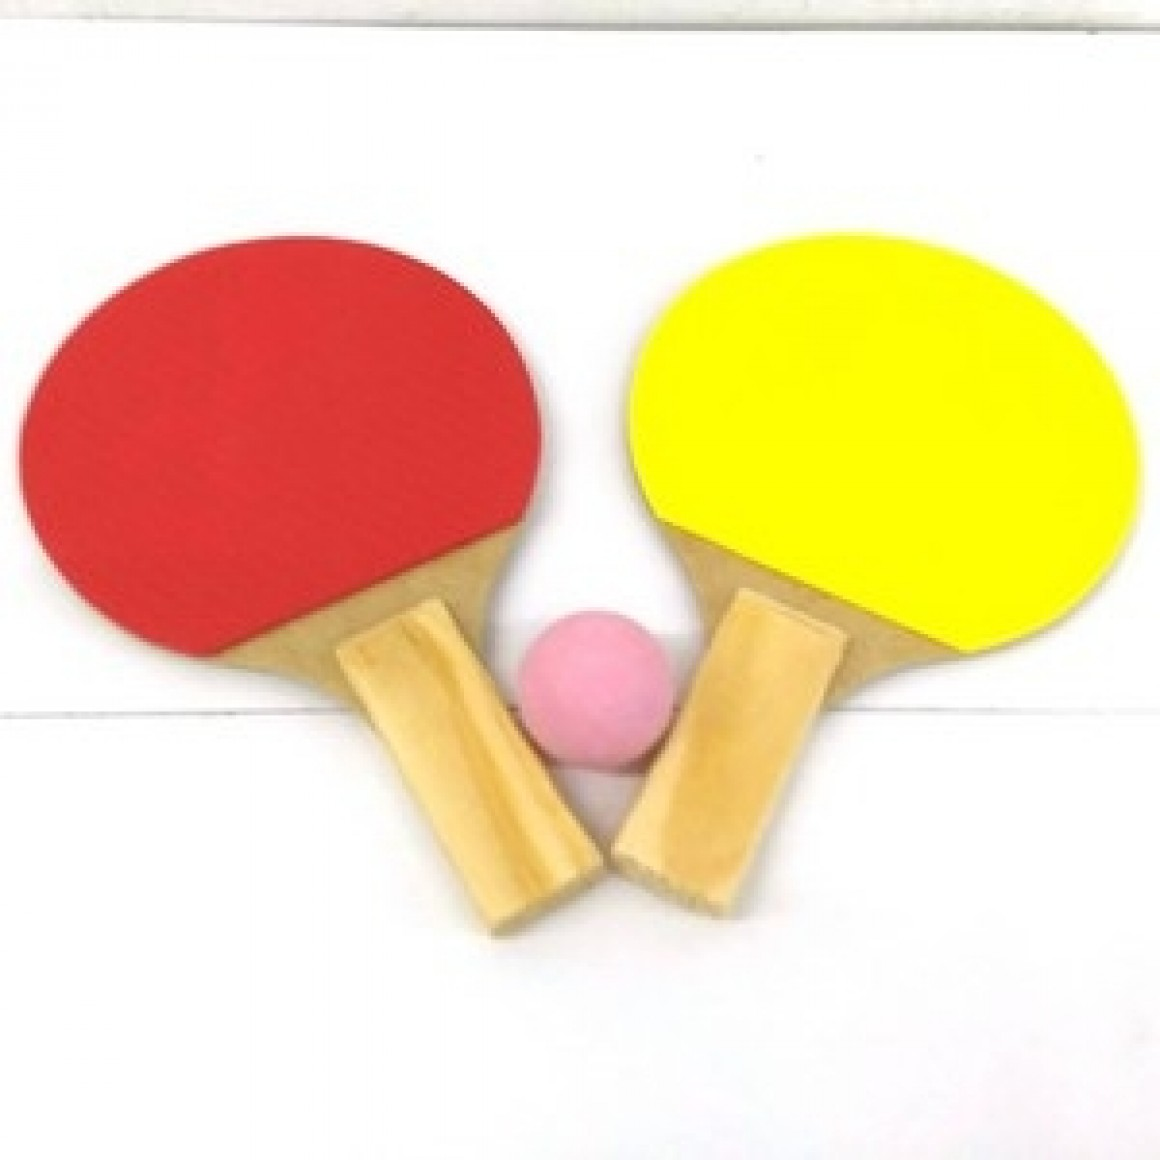 brinquedo raquete ping pong